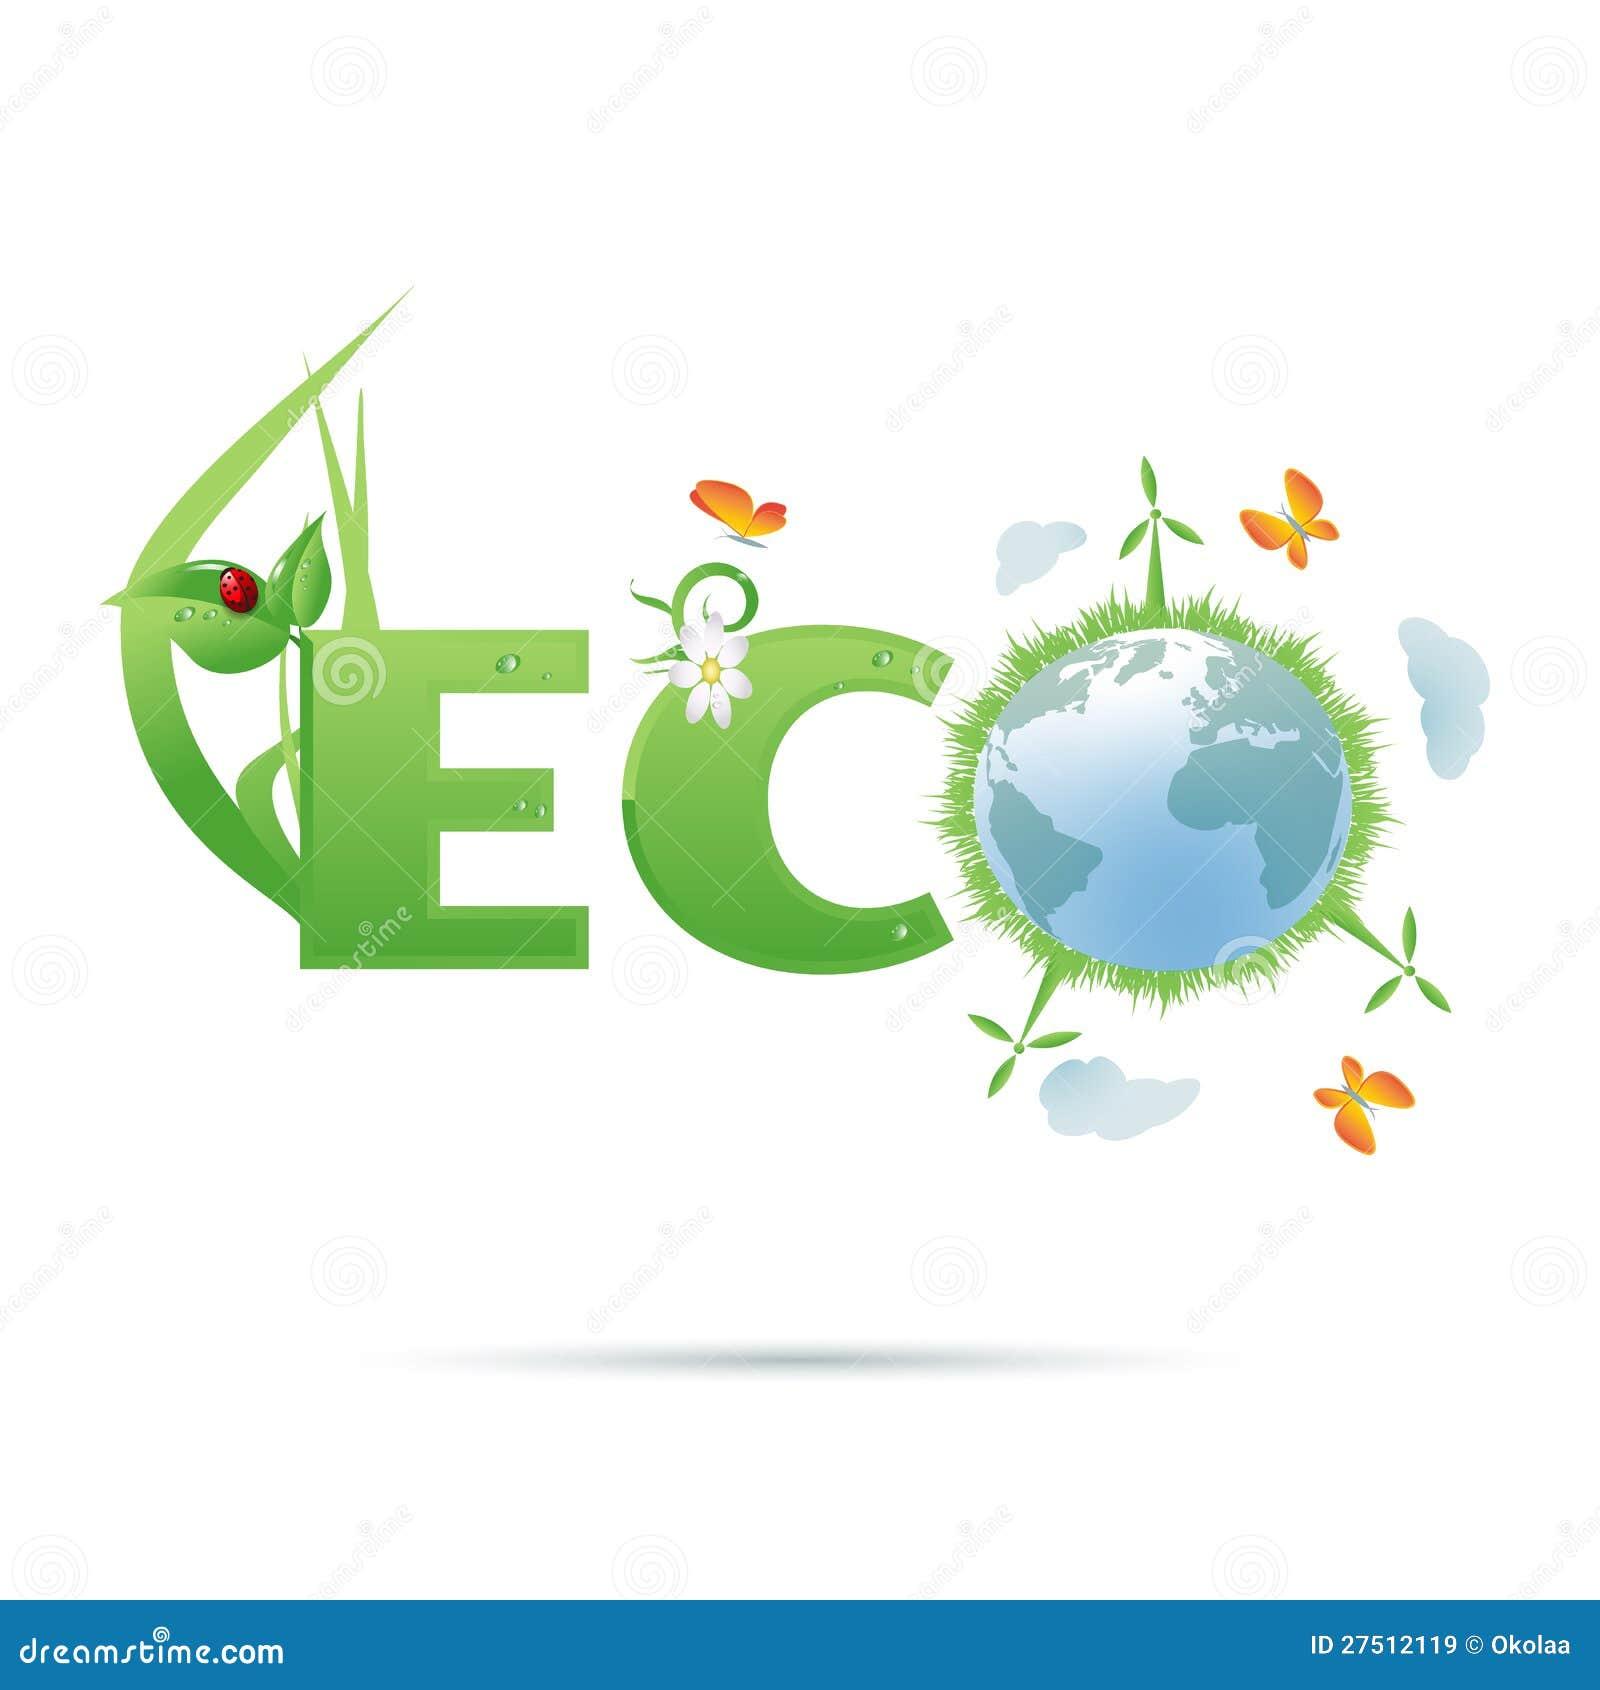 Eco planet Text Symbol Royalty Free Stock Image